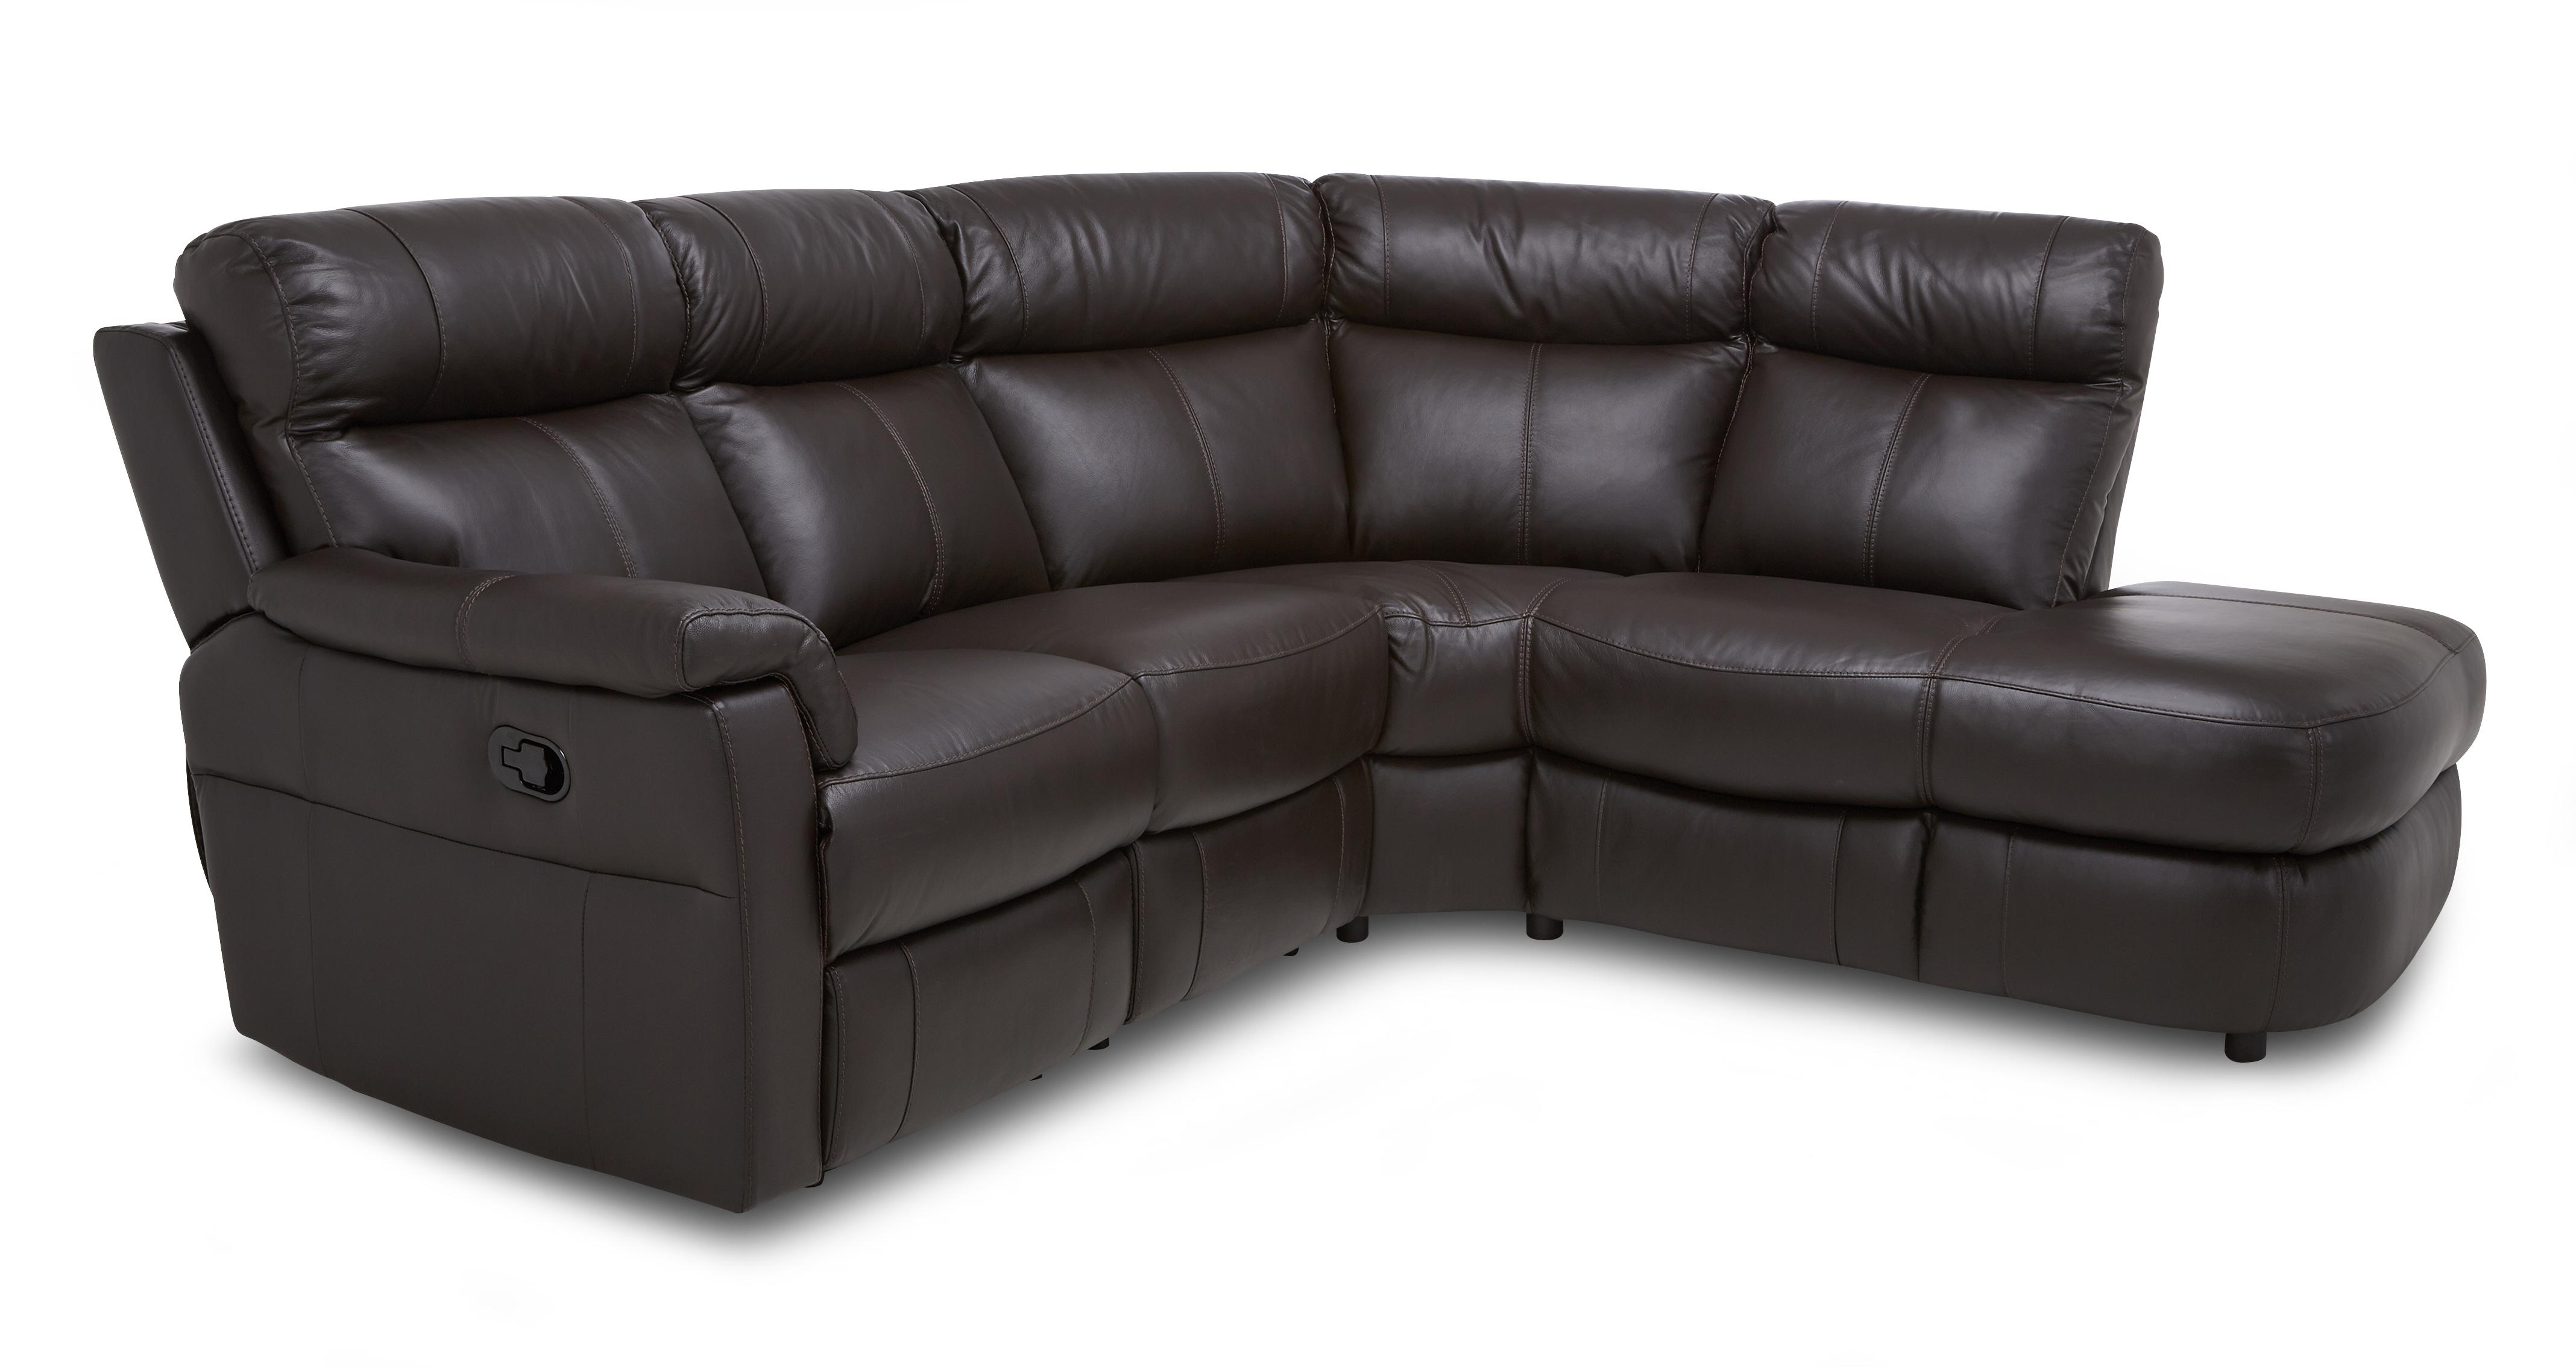 Ellis Option B Left Arm Facing 2 Piece Manual Recliner Corner Sofa  Essential | DFS